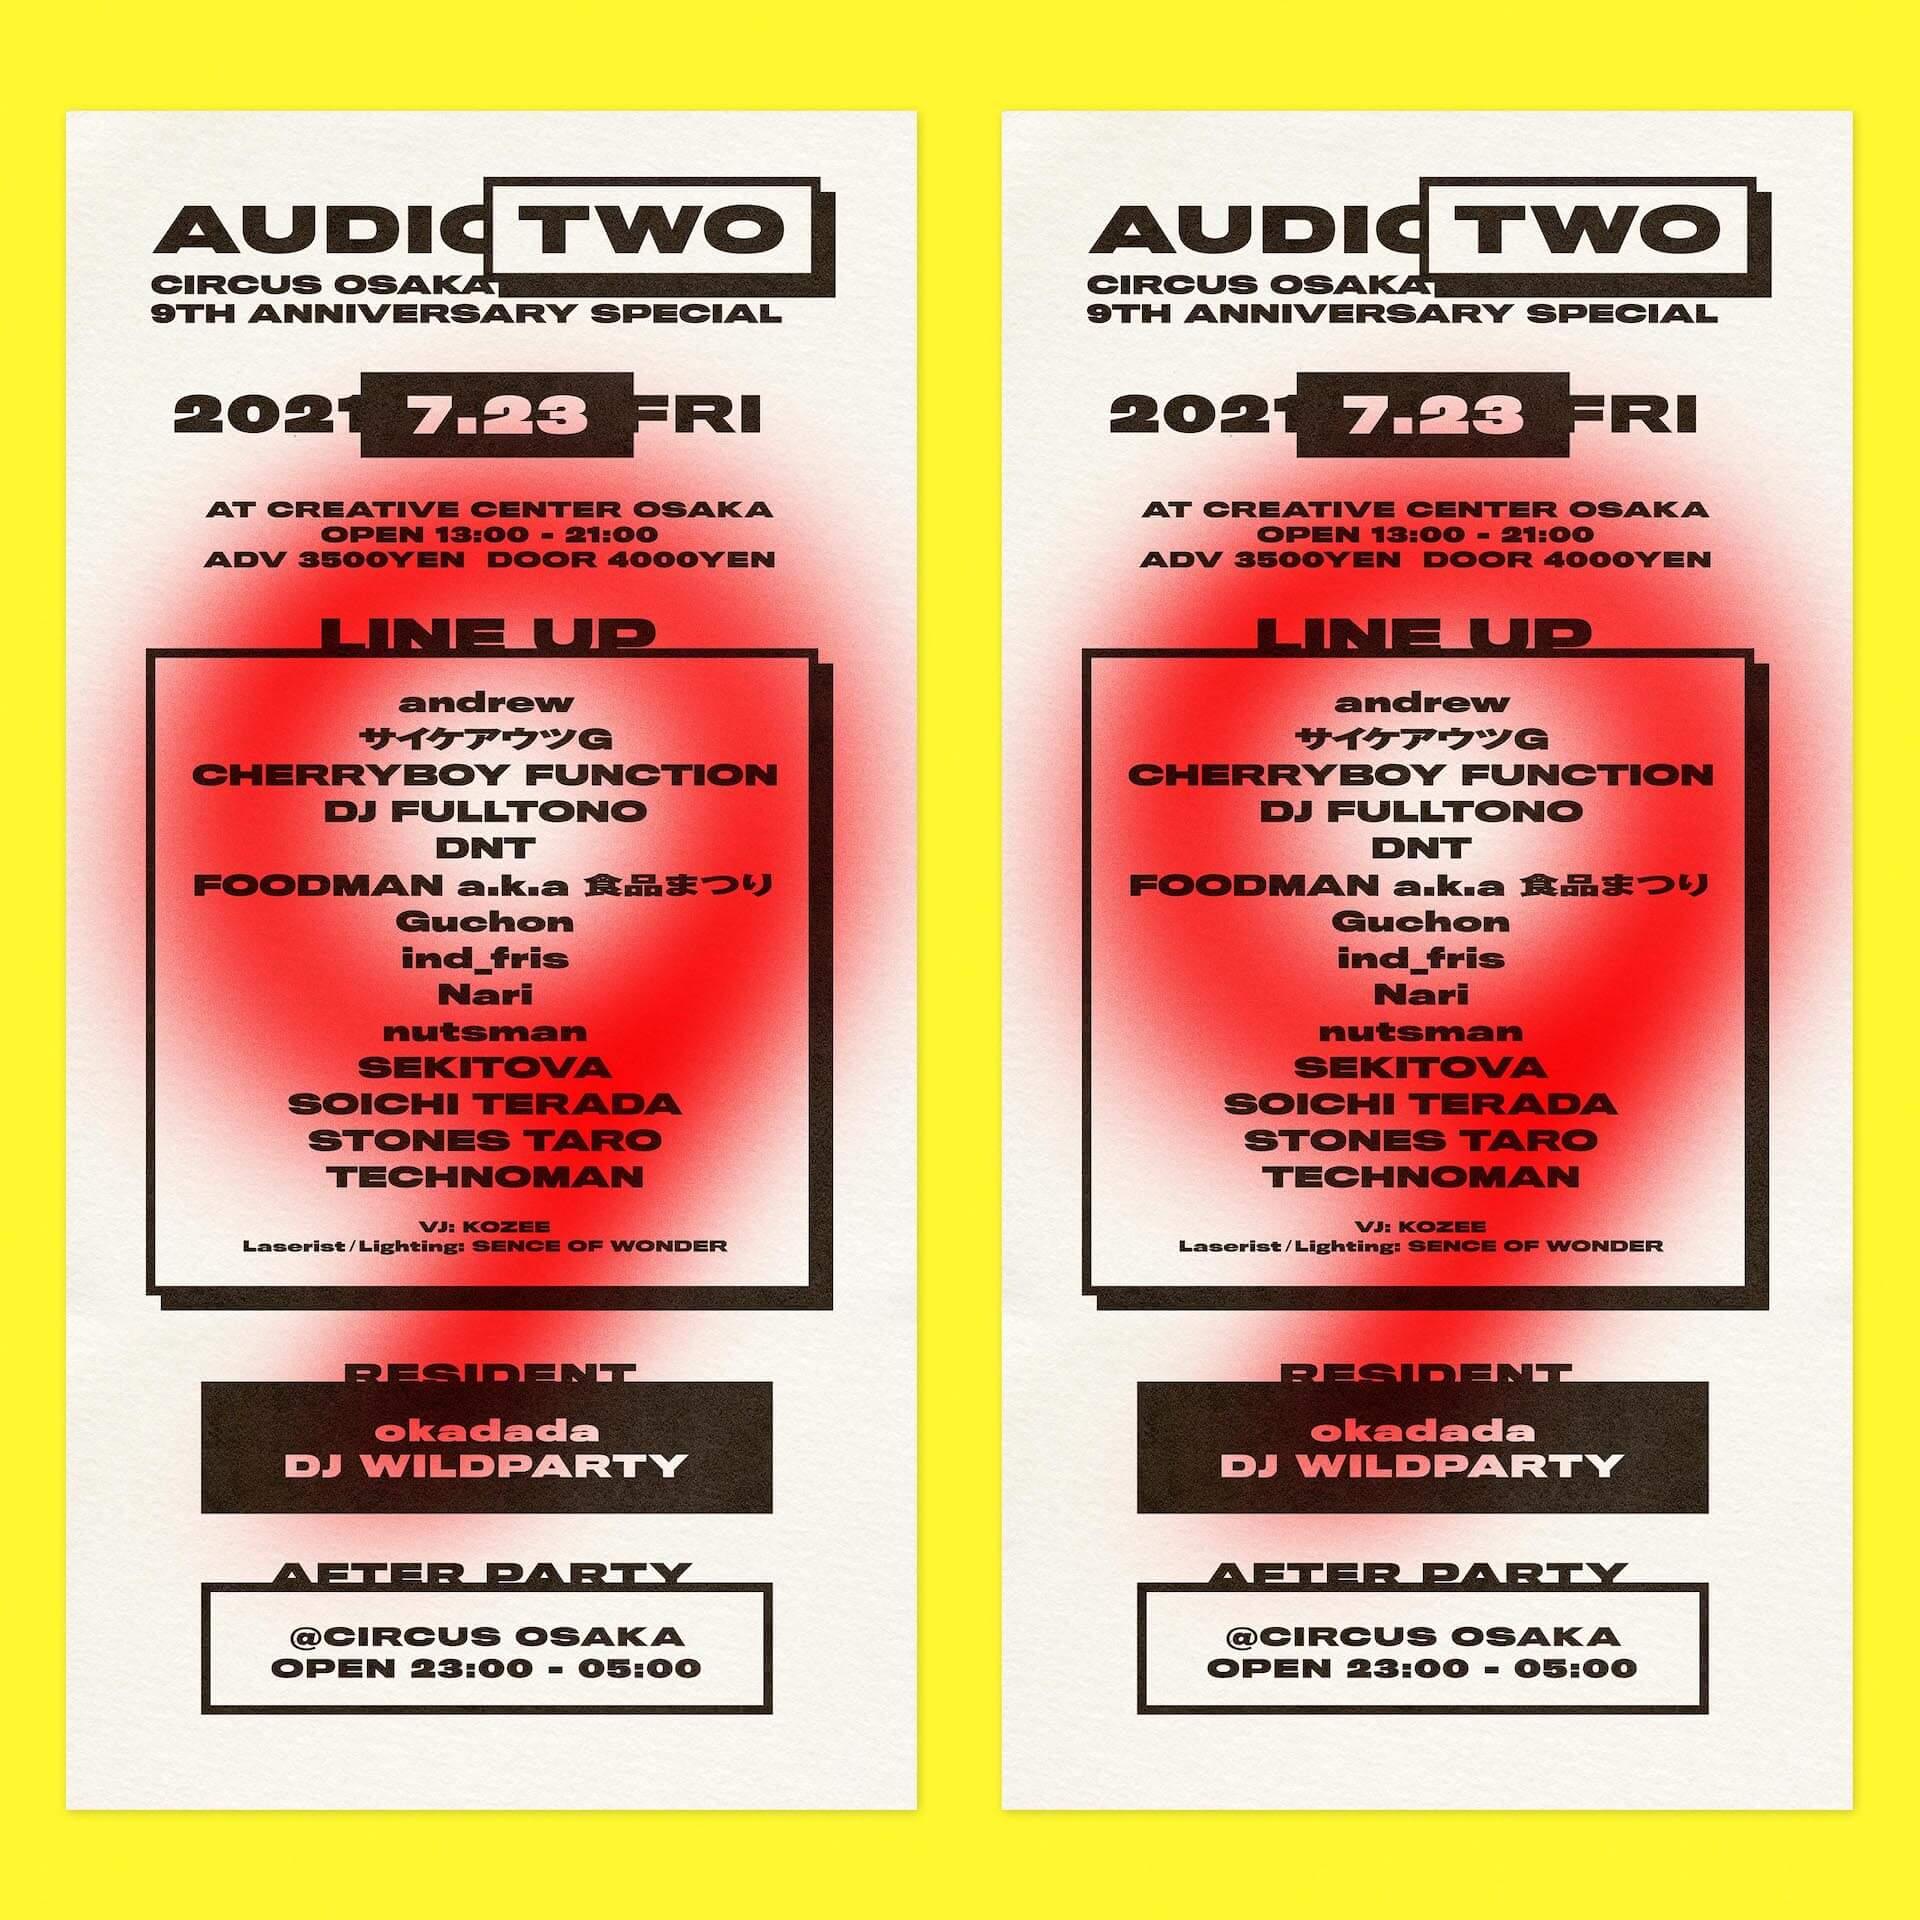 CIRCUS OSAKA9周年番外編<AUDIO TWO>のタイムテーブル&アフターパーティーが発表! music210720_circusosaka_audiotwo_5